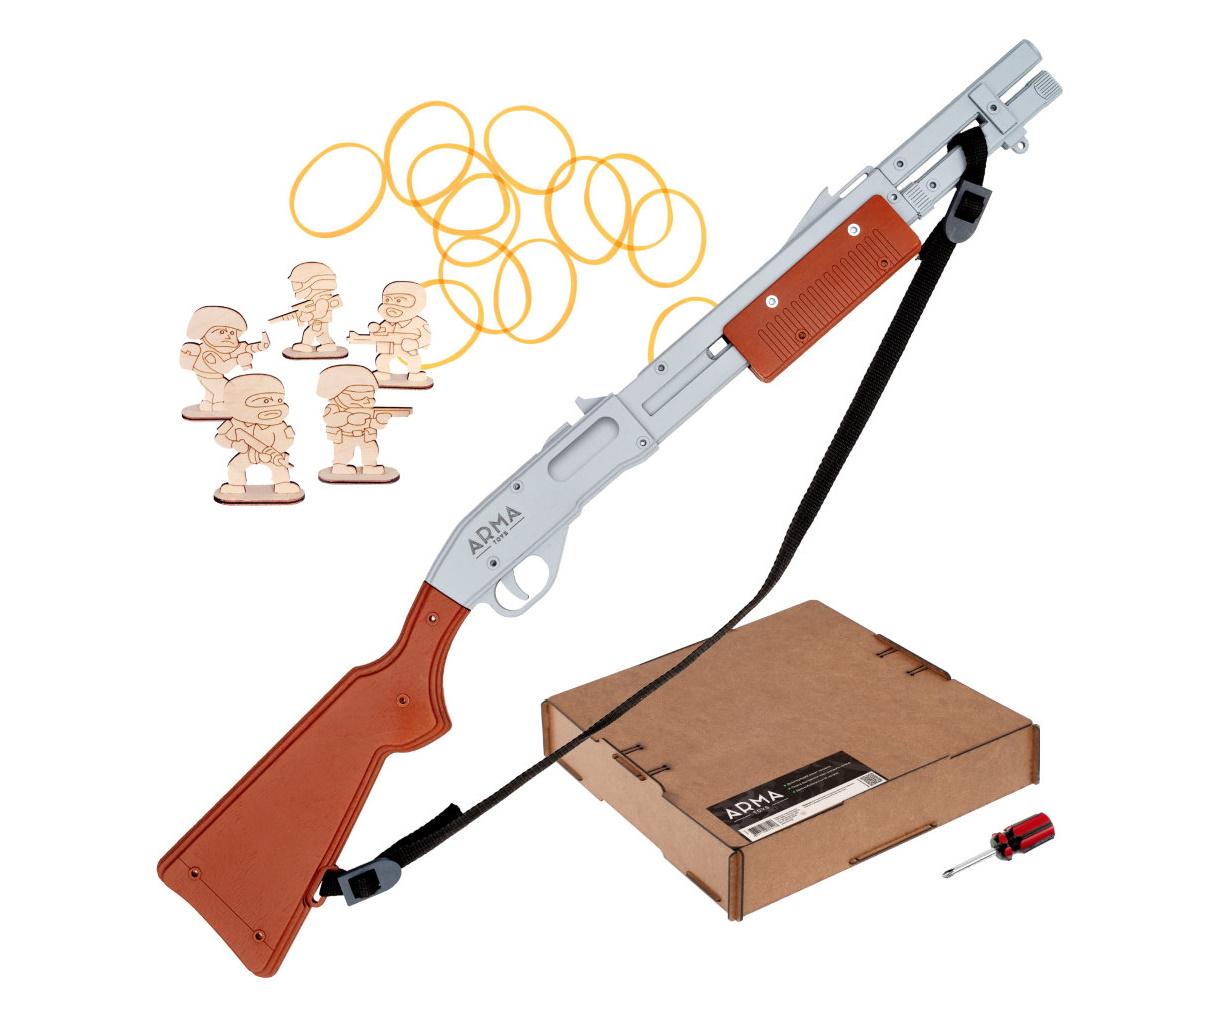 Резинкострел ARMA макет дробовика Remington 870, длинный